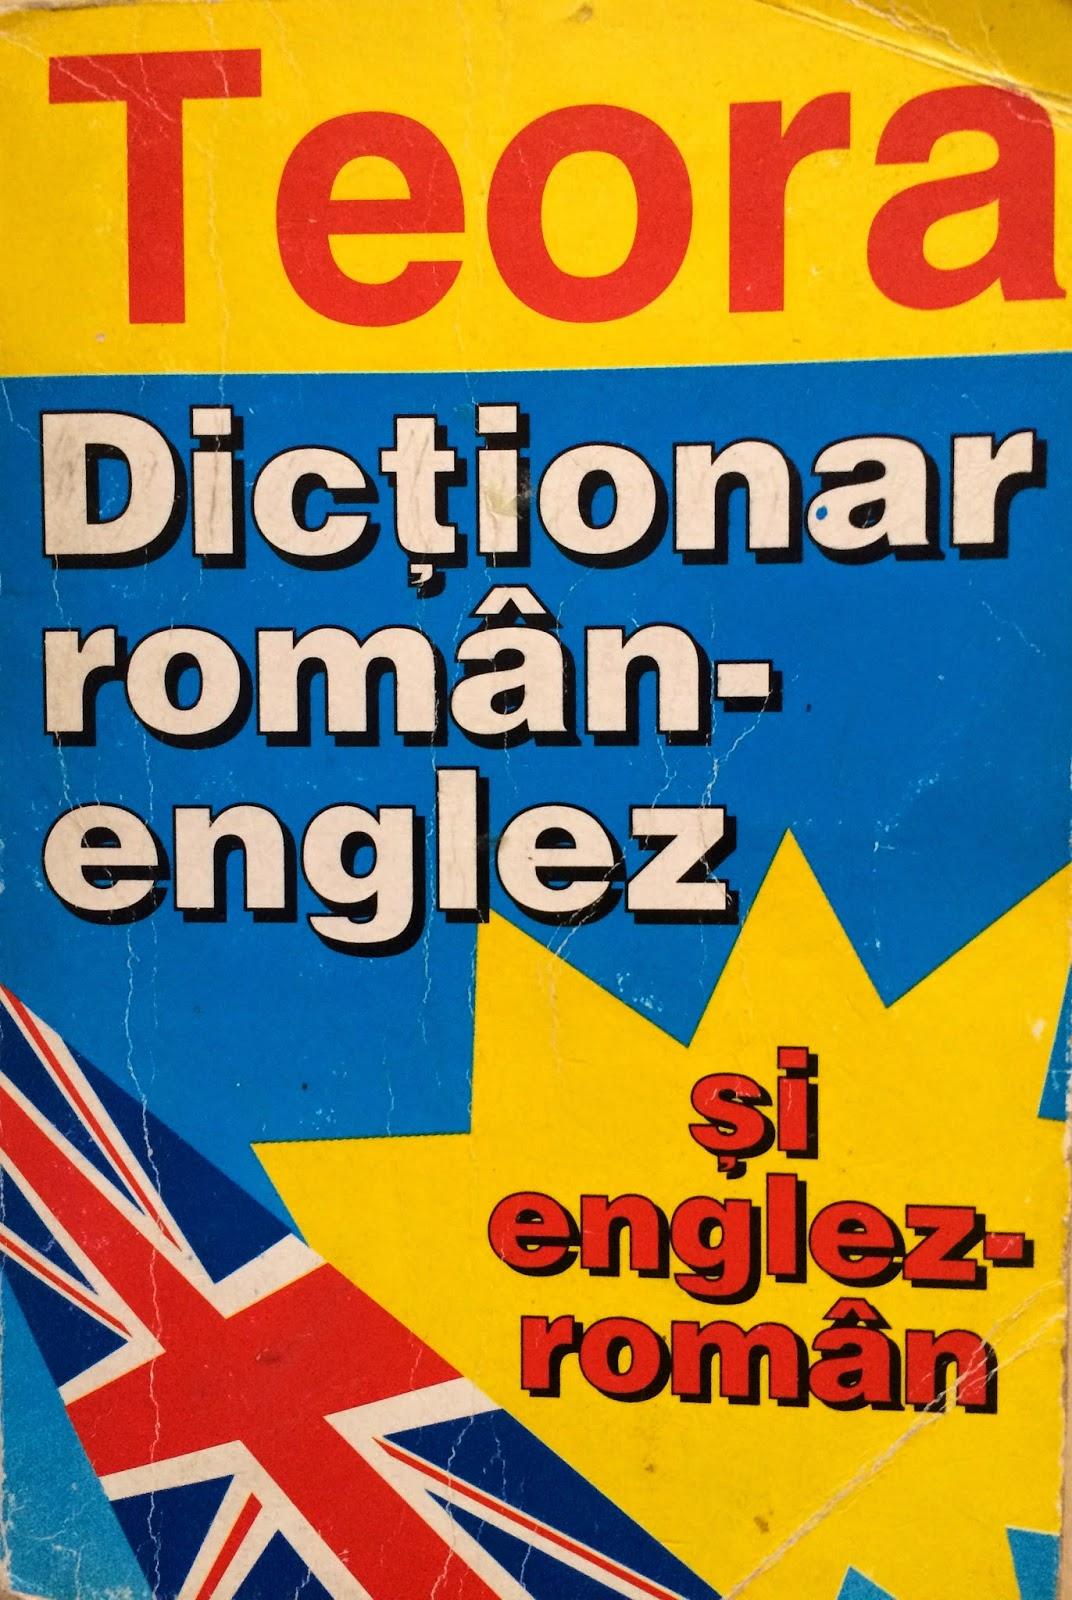 Translator englez romana online dating 2